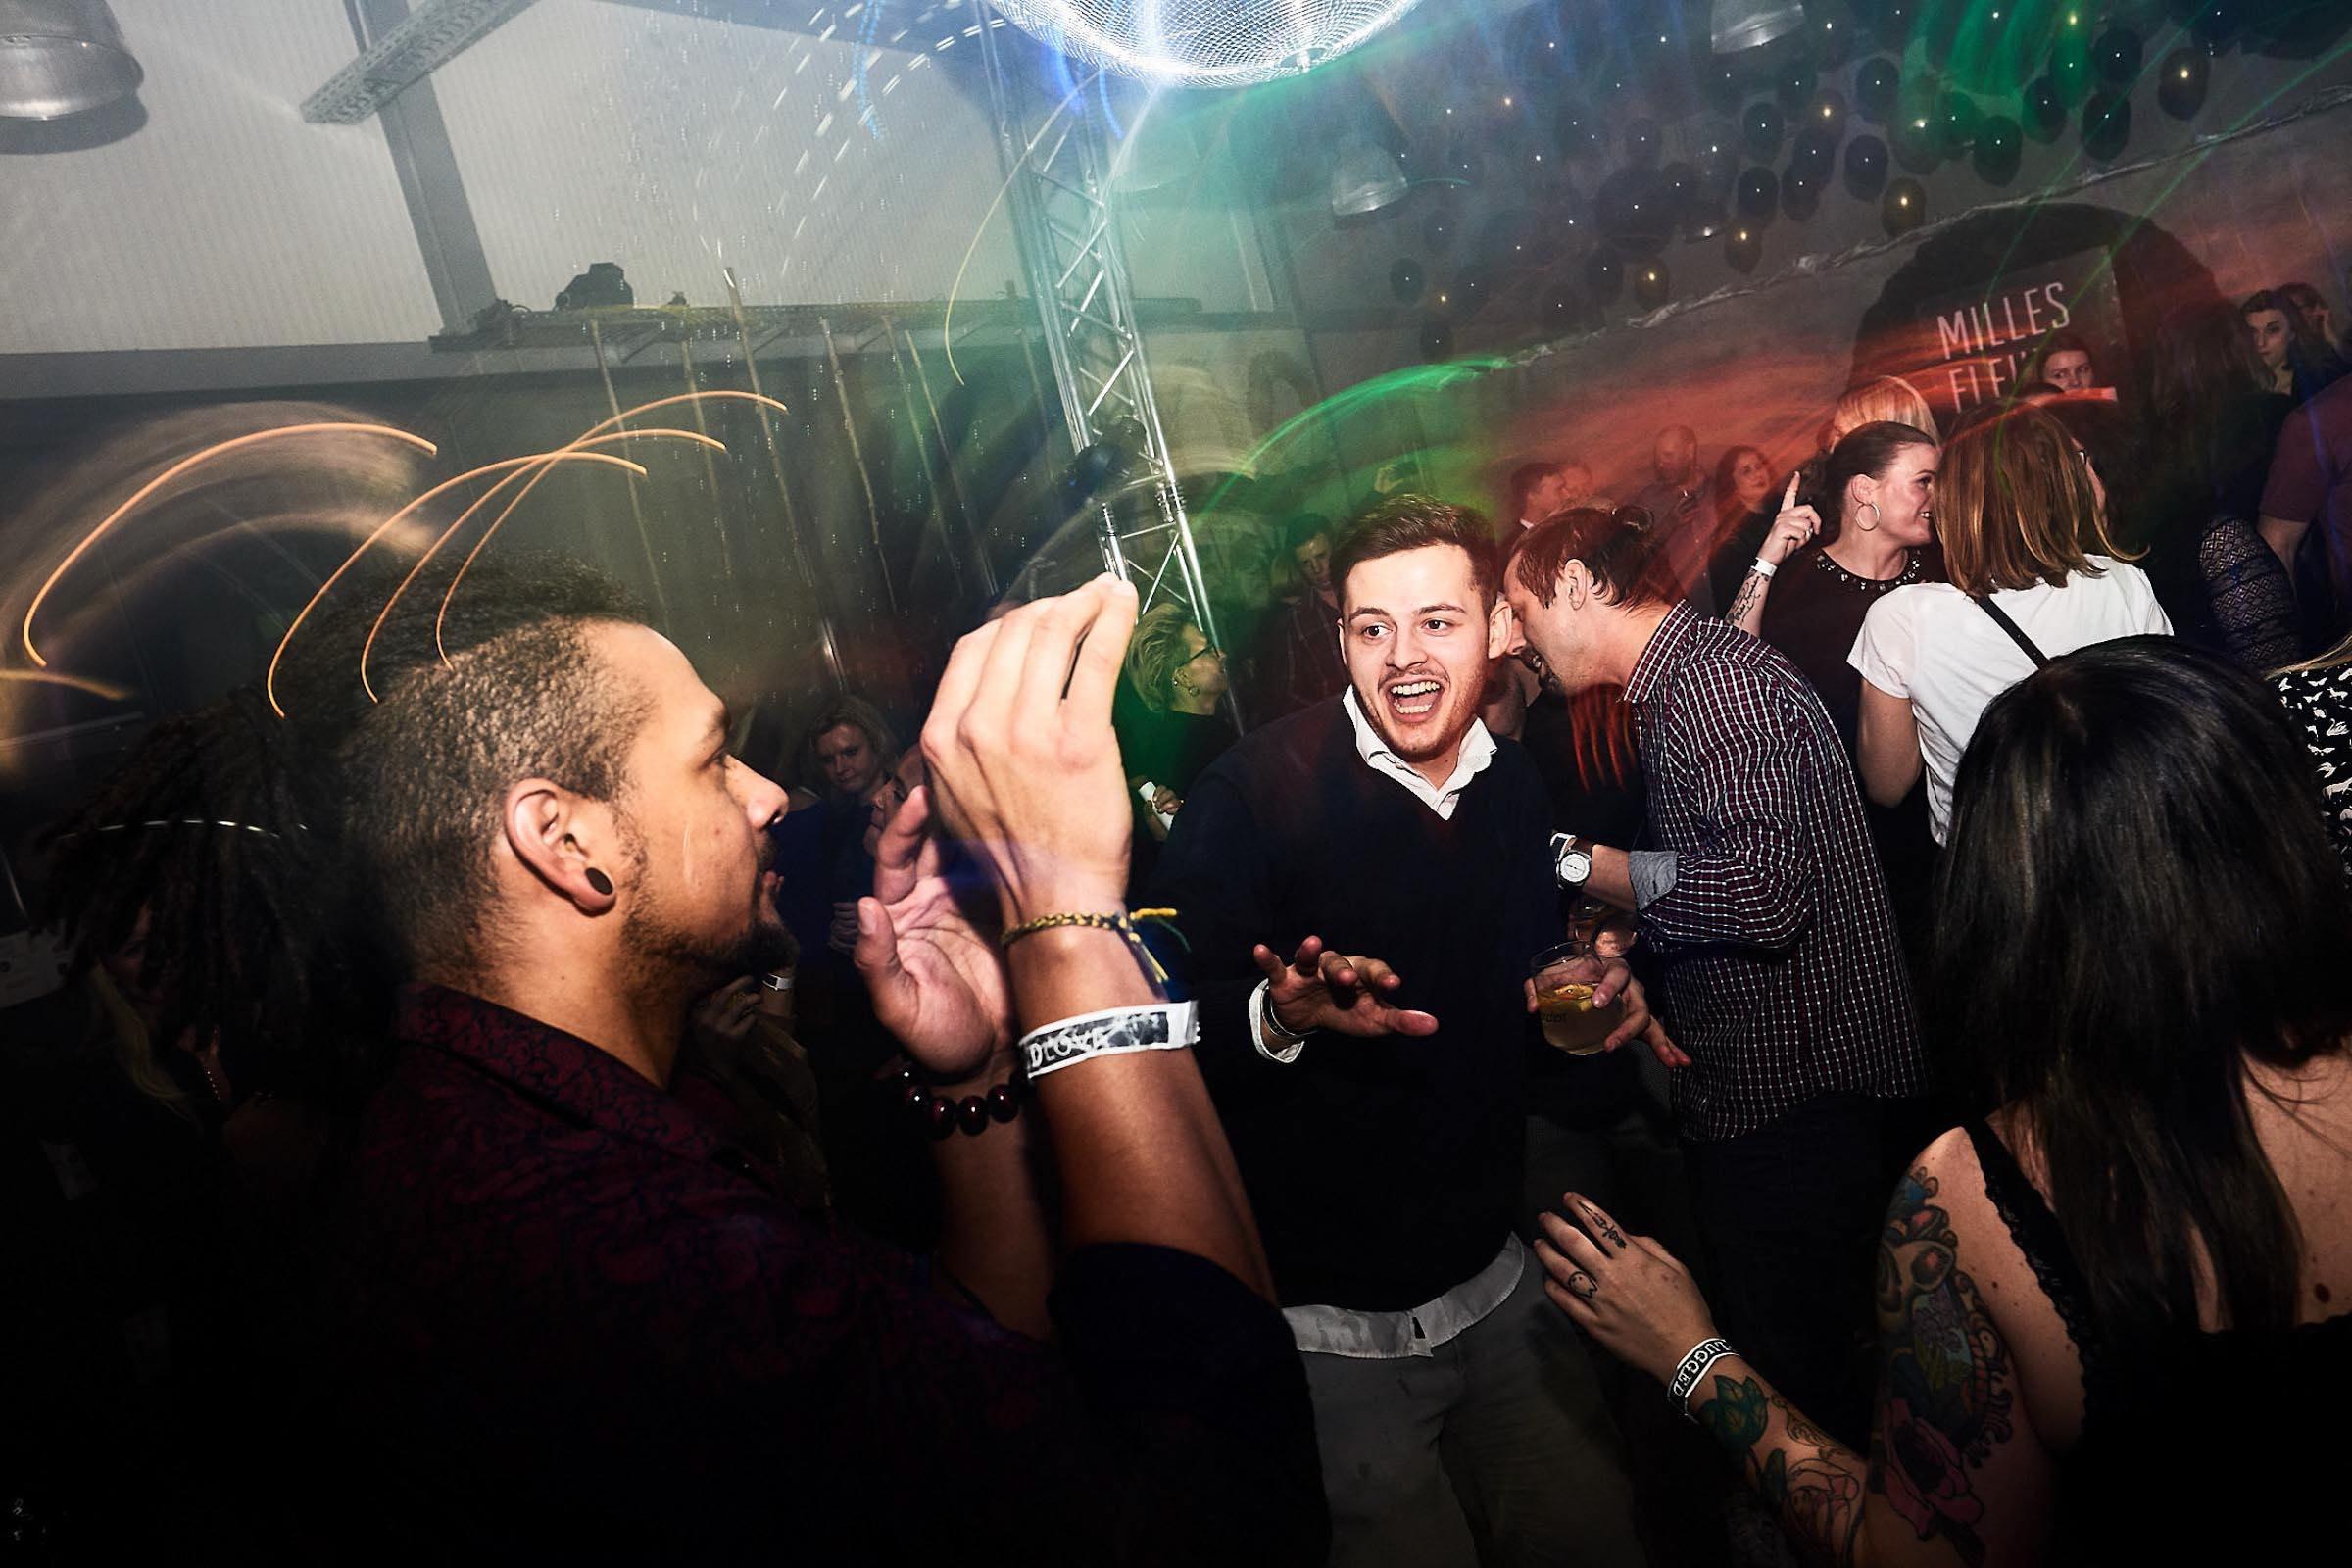 DJ | Geburtstag | DJ | Agentur | DJ | Messe | DJ | Firmenevent | Firmenfeier | DJ | Weihnachtsfeier | DJ | Sommerfest | DJ | Weihnachtsfeier | DJ | Party | Event | Buchen | Anfragen | Lehmann | Eventservice